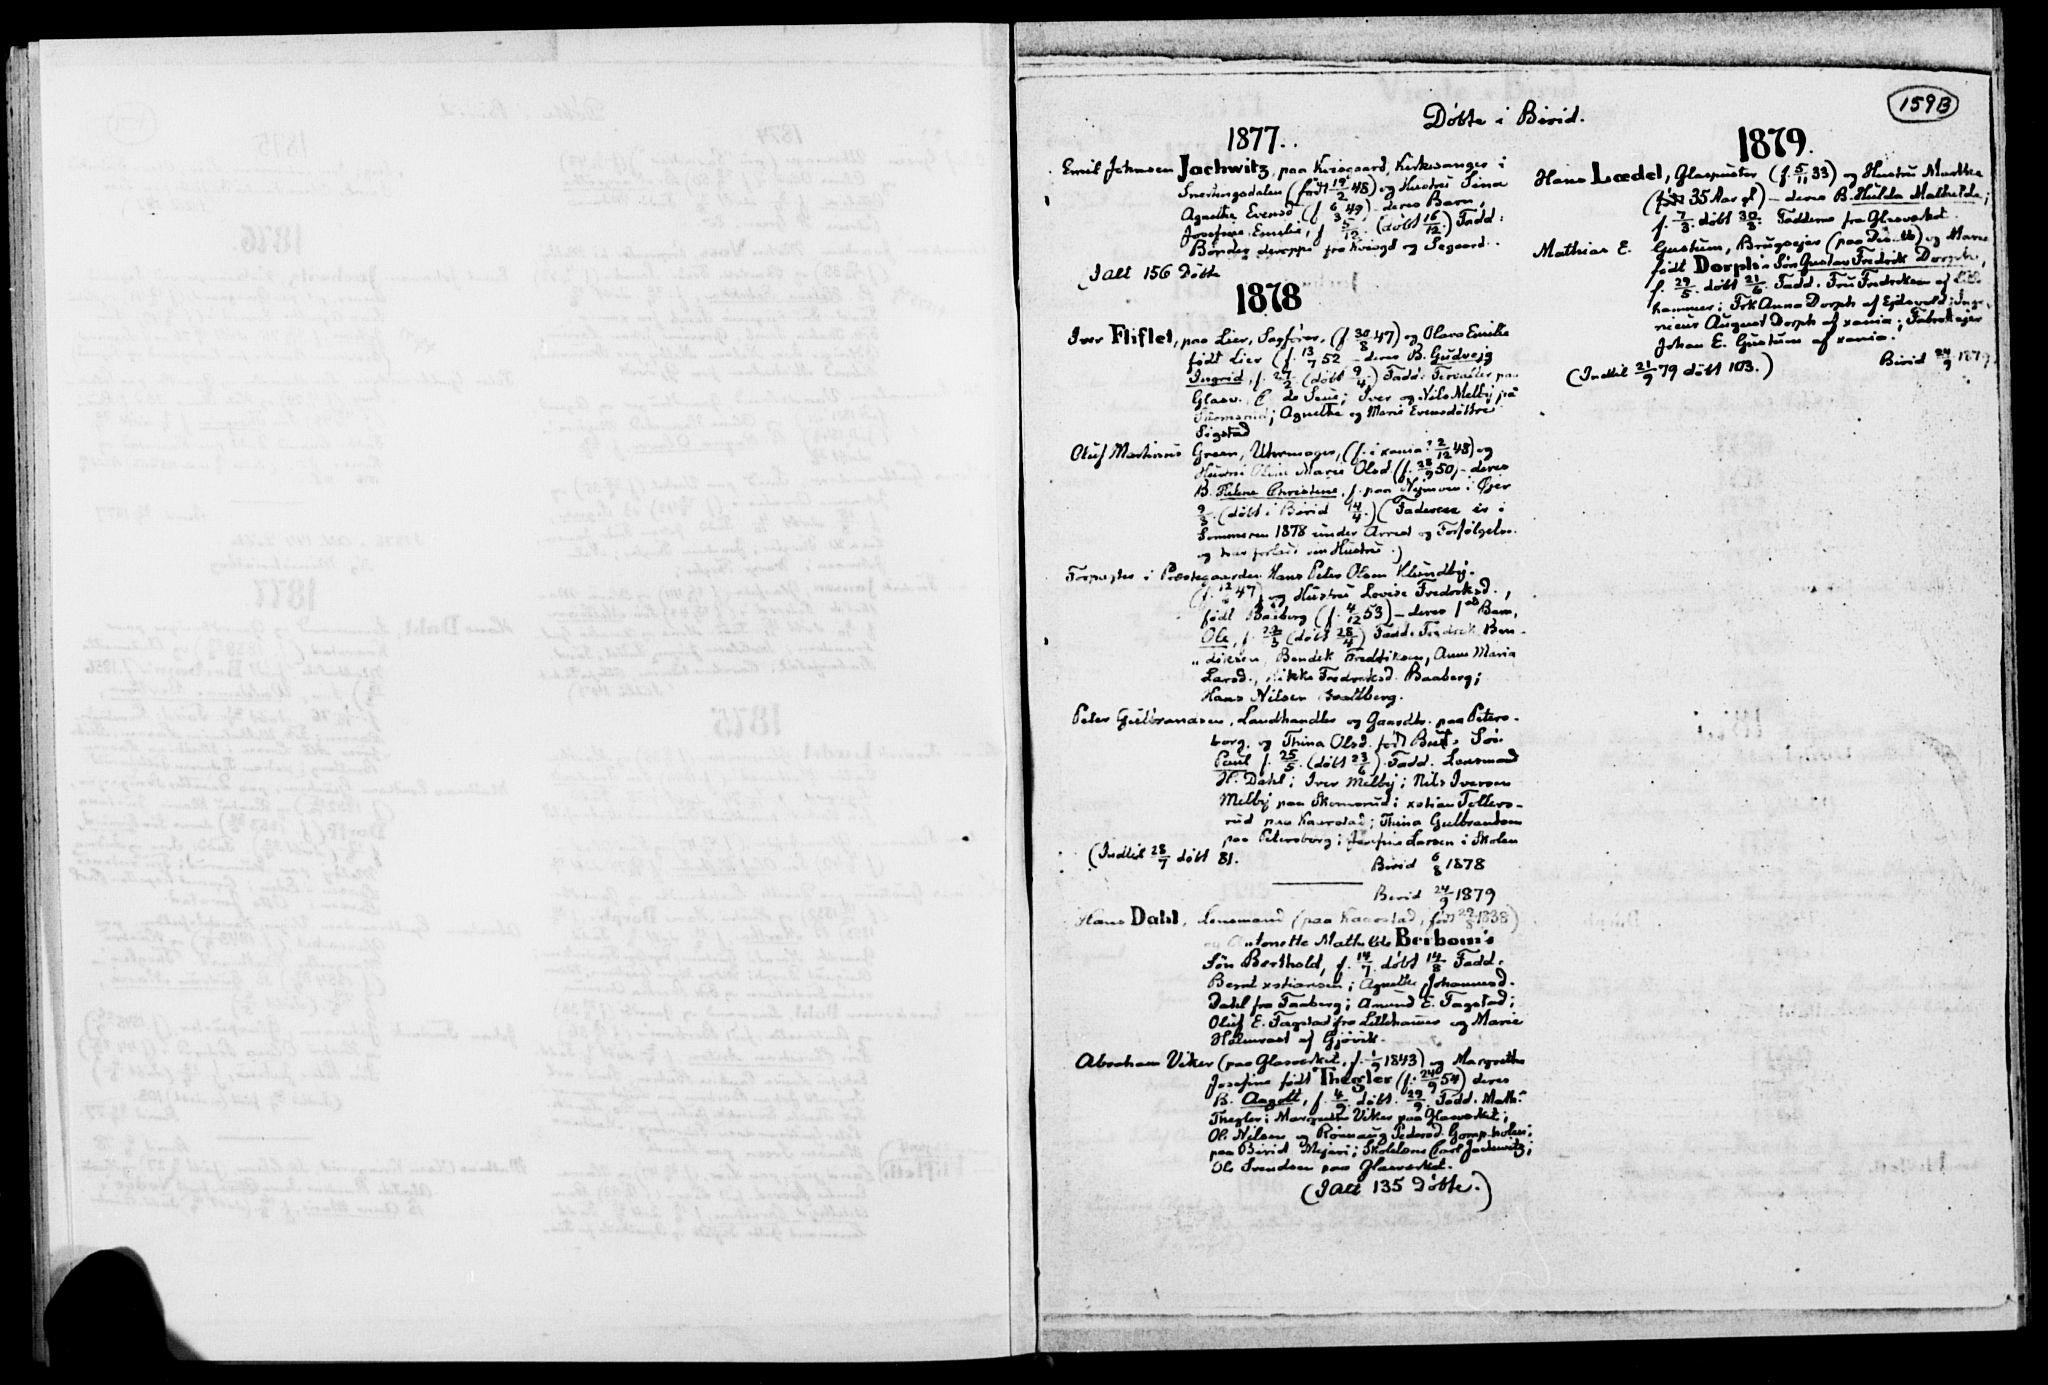 SAH, Biri prestekontor, Ministerialbok, 1730-1879, s. 159b